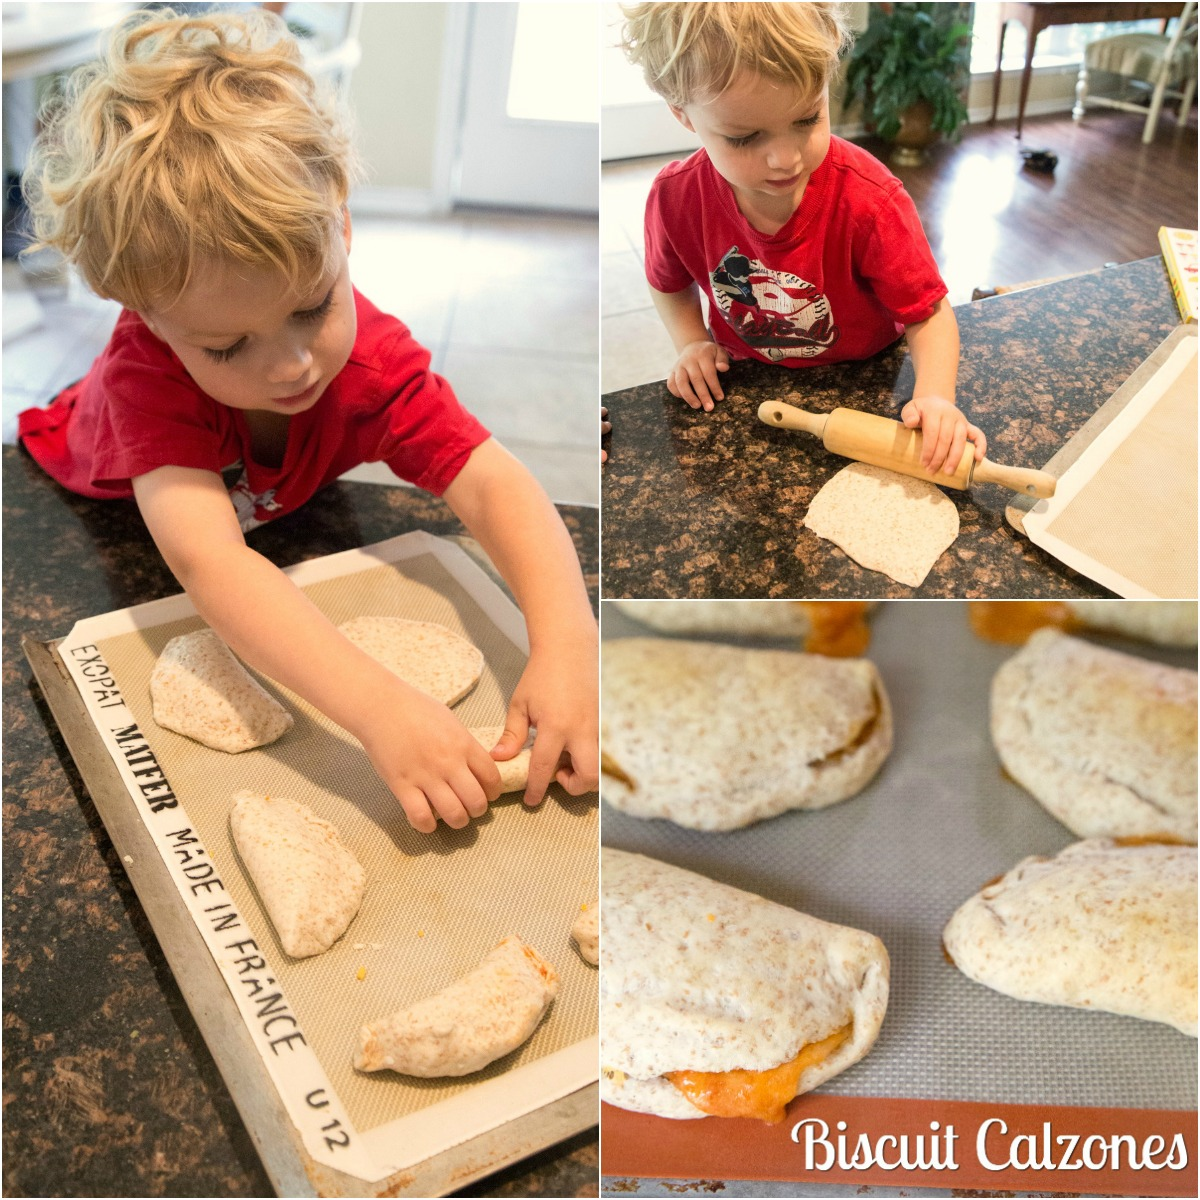 Kid Friendly Recipe for Biscuit Calzones